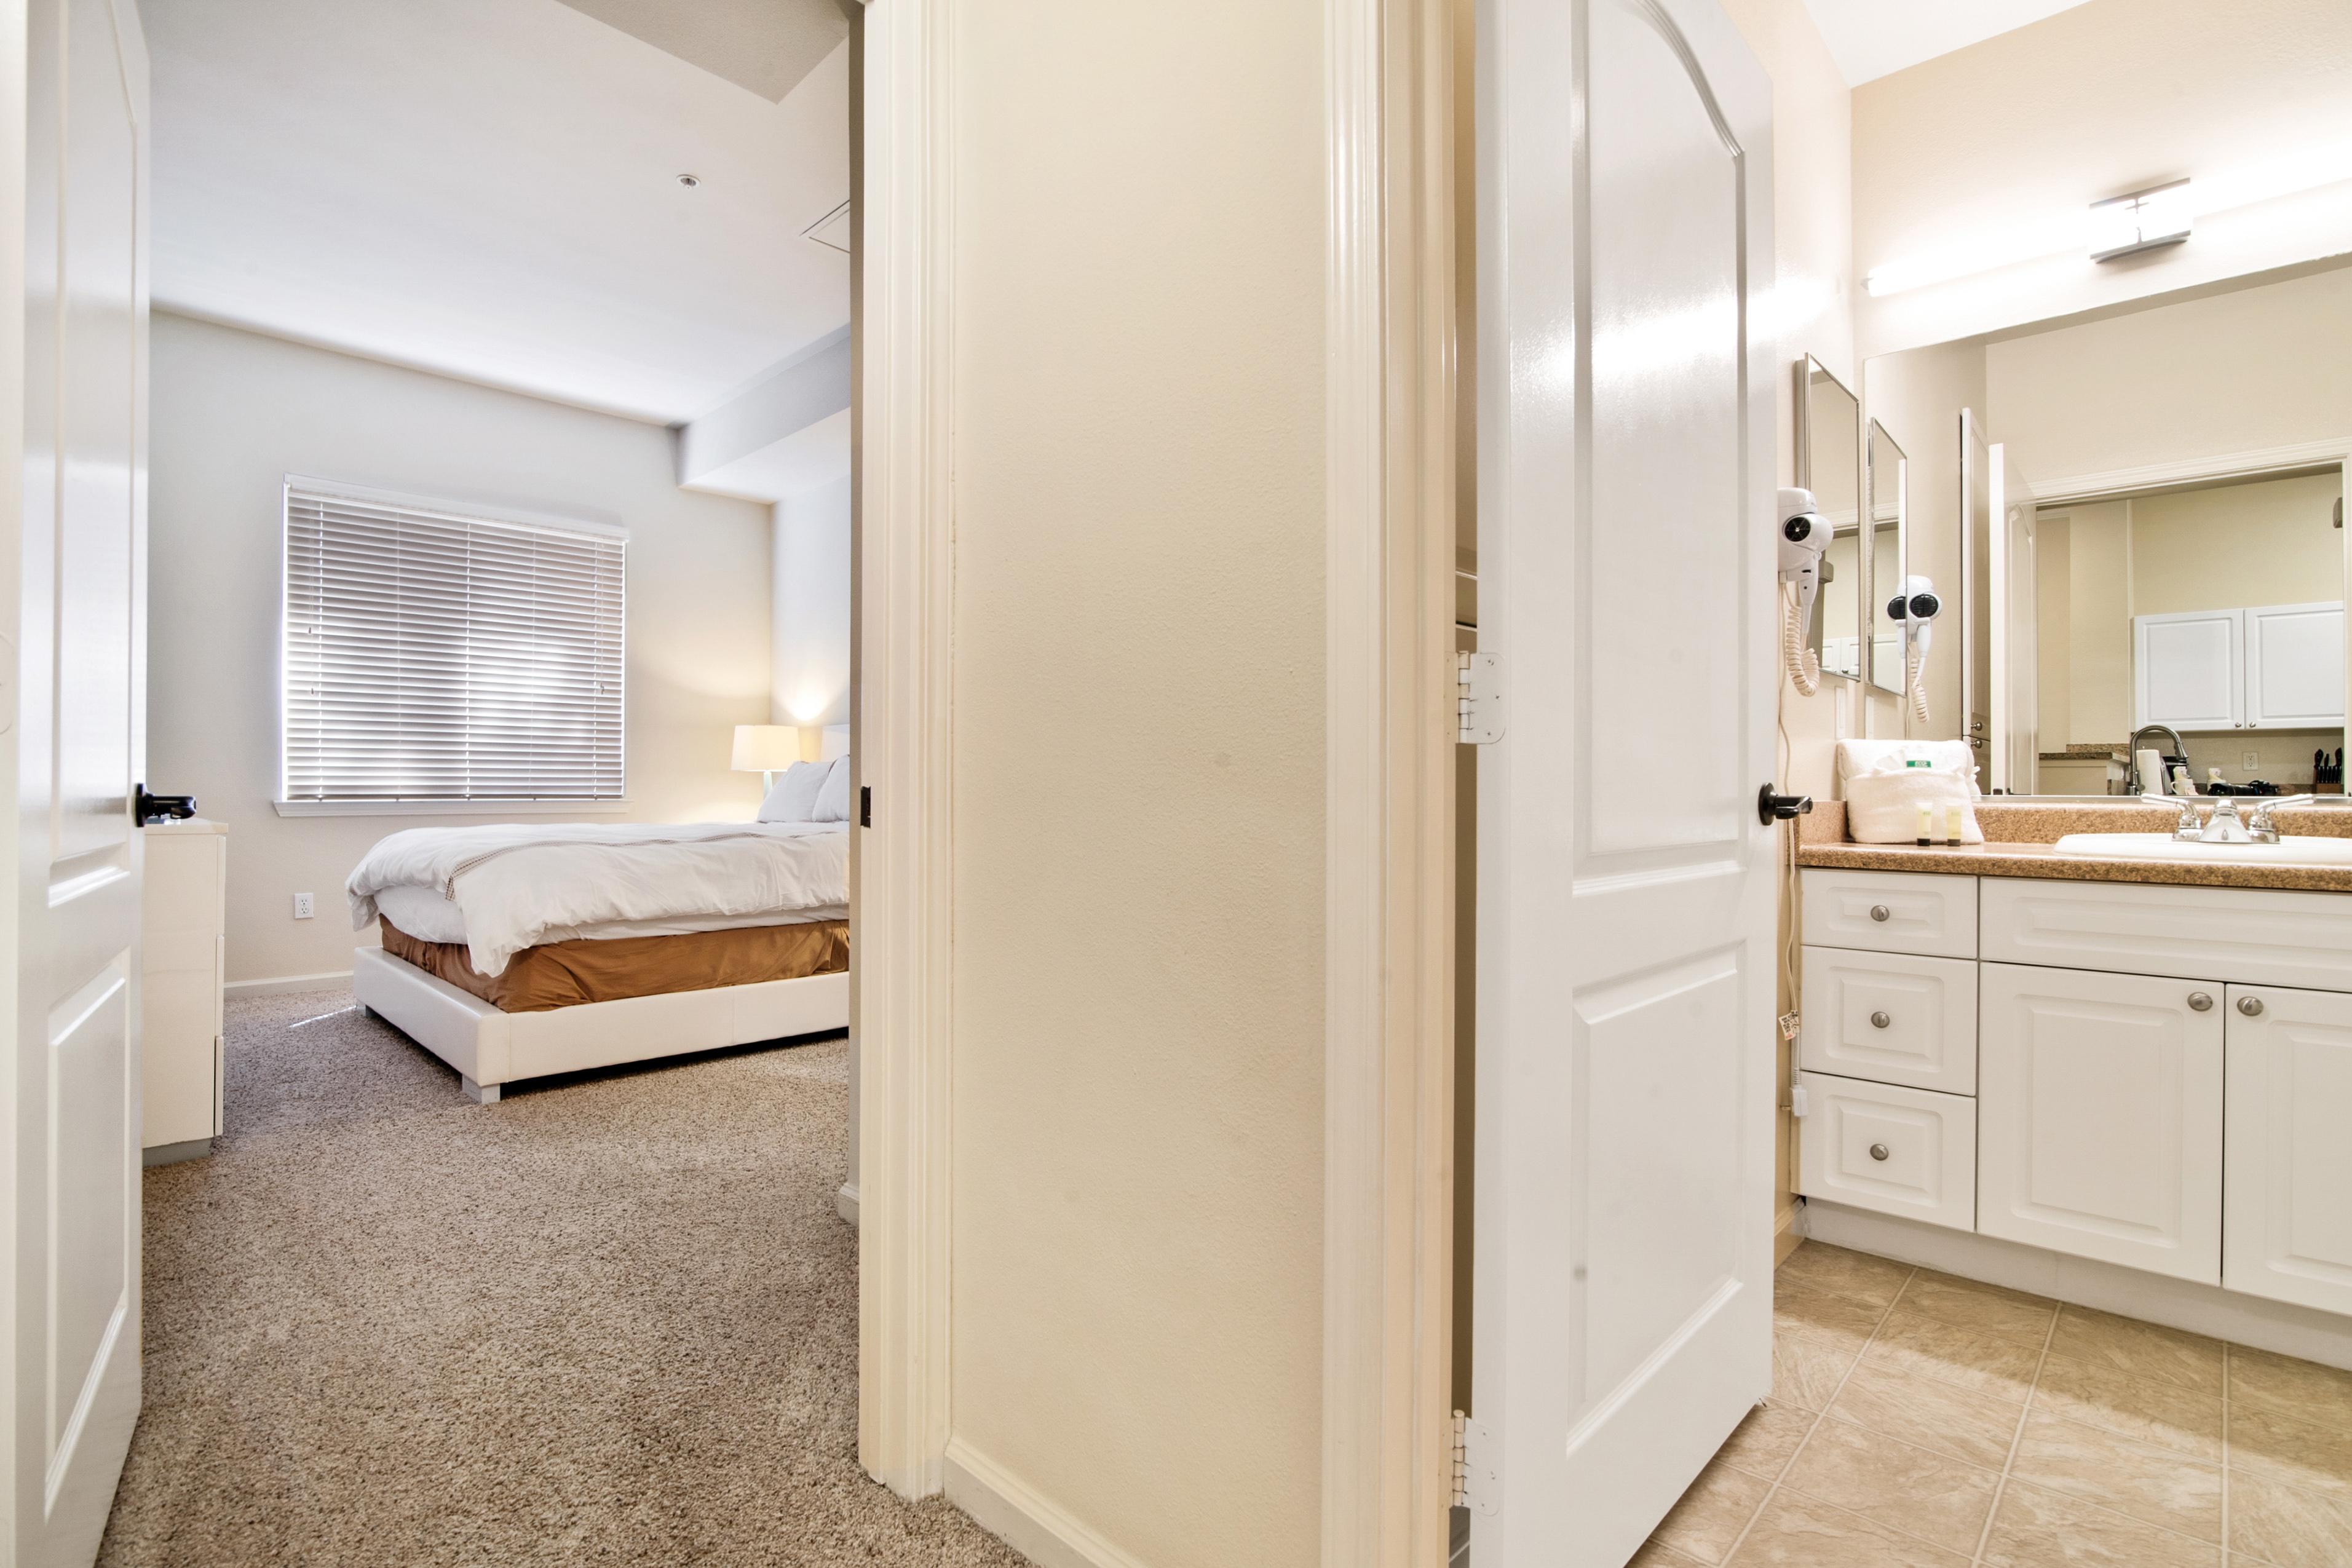 image 6 furnished 1 bedroom Apartment for rent in Santa Clara, Santa Clara County